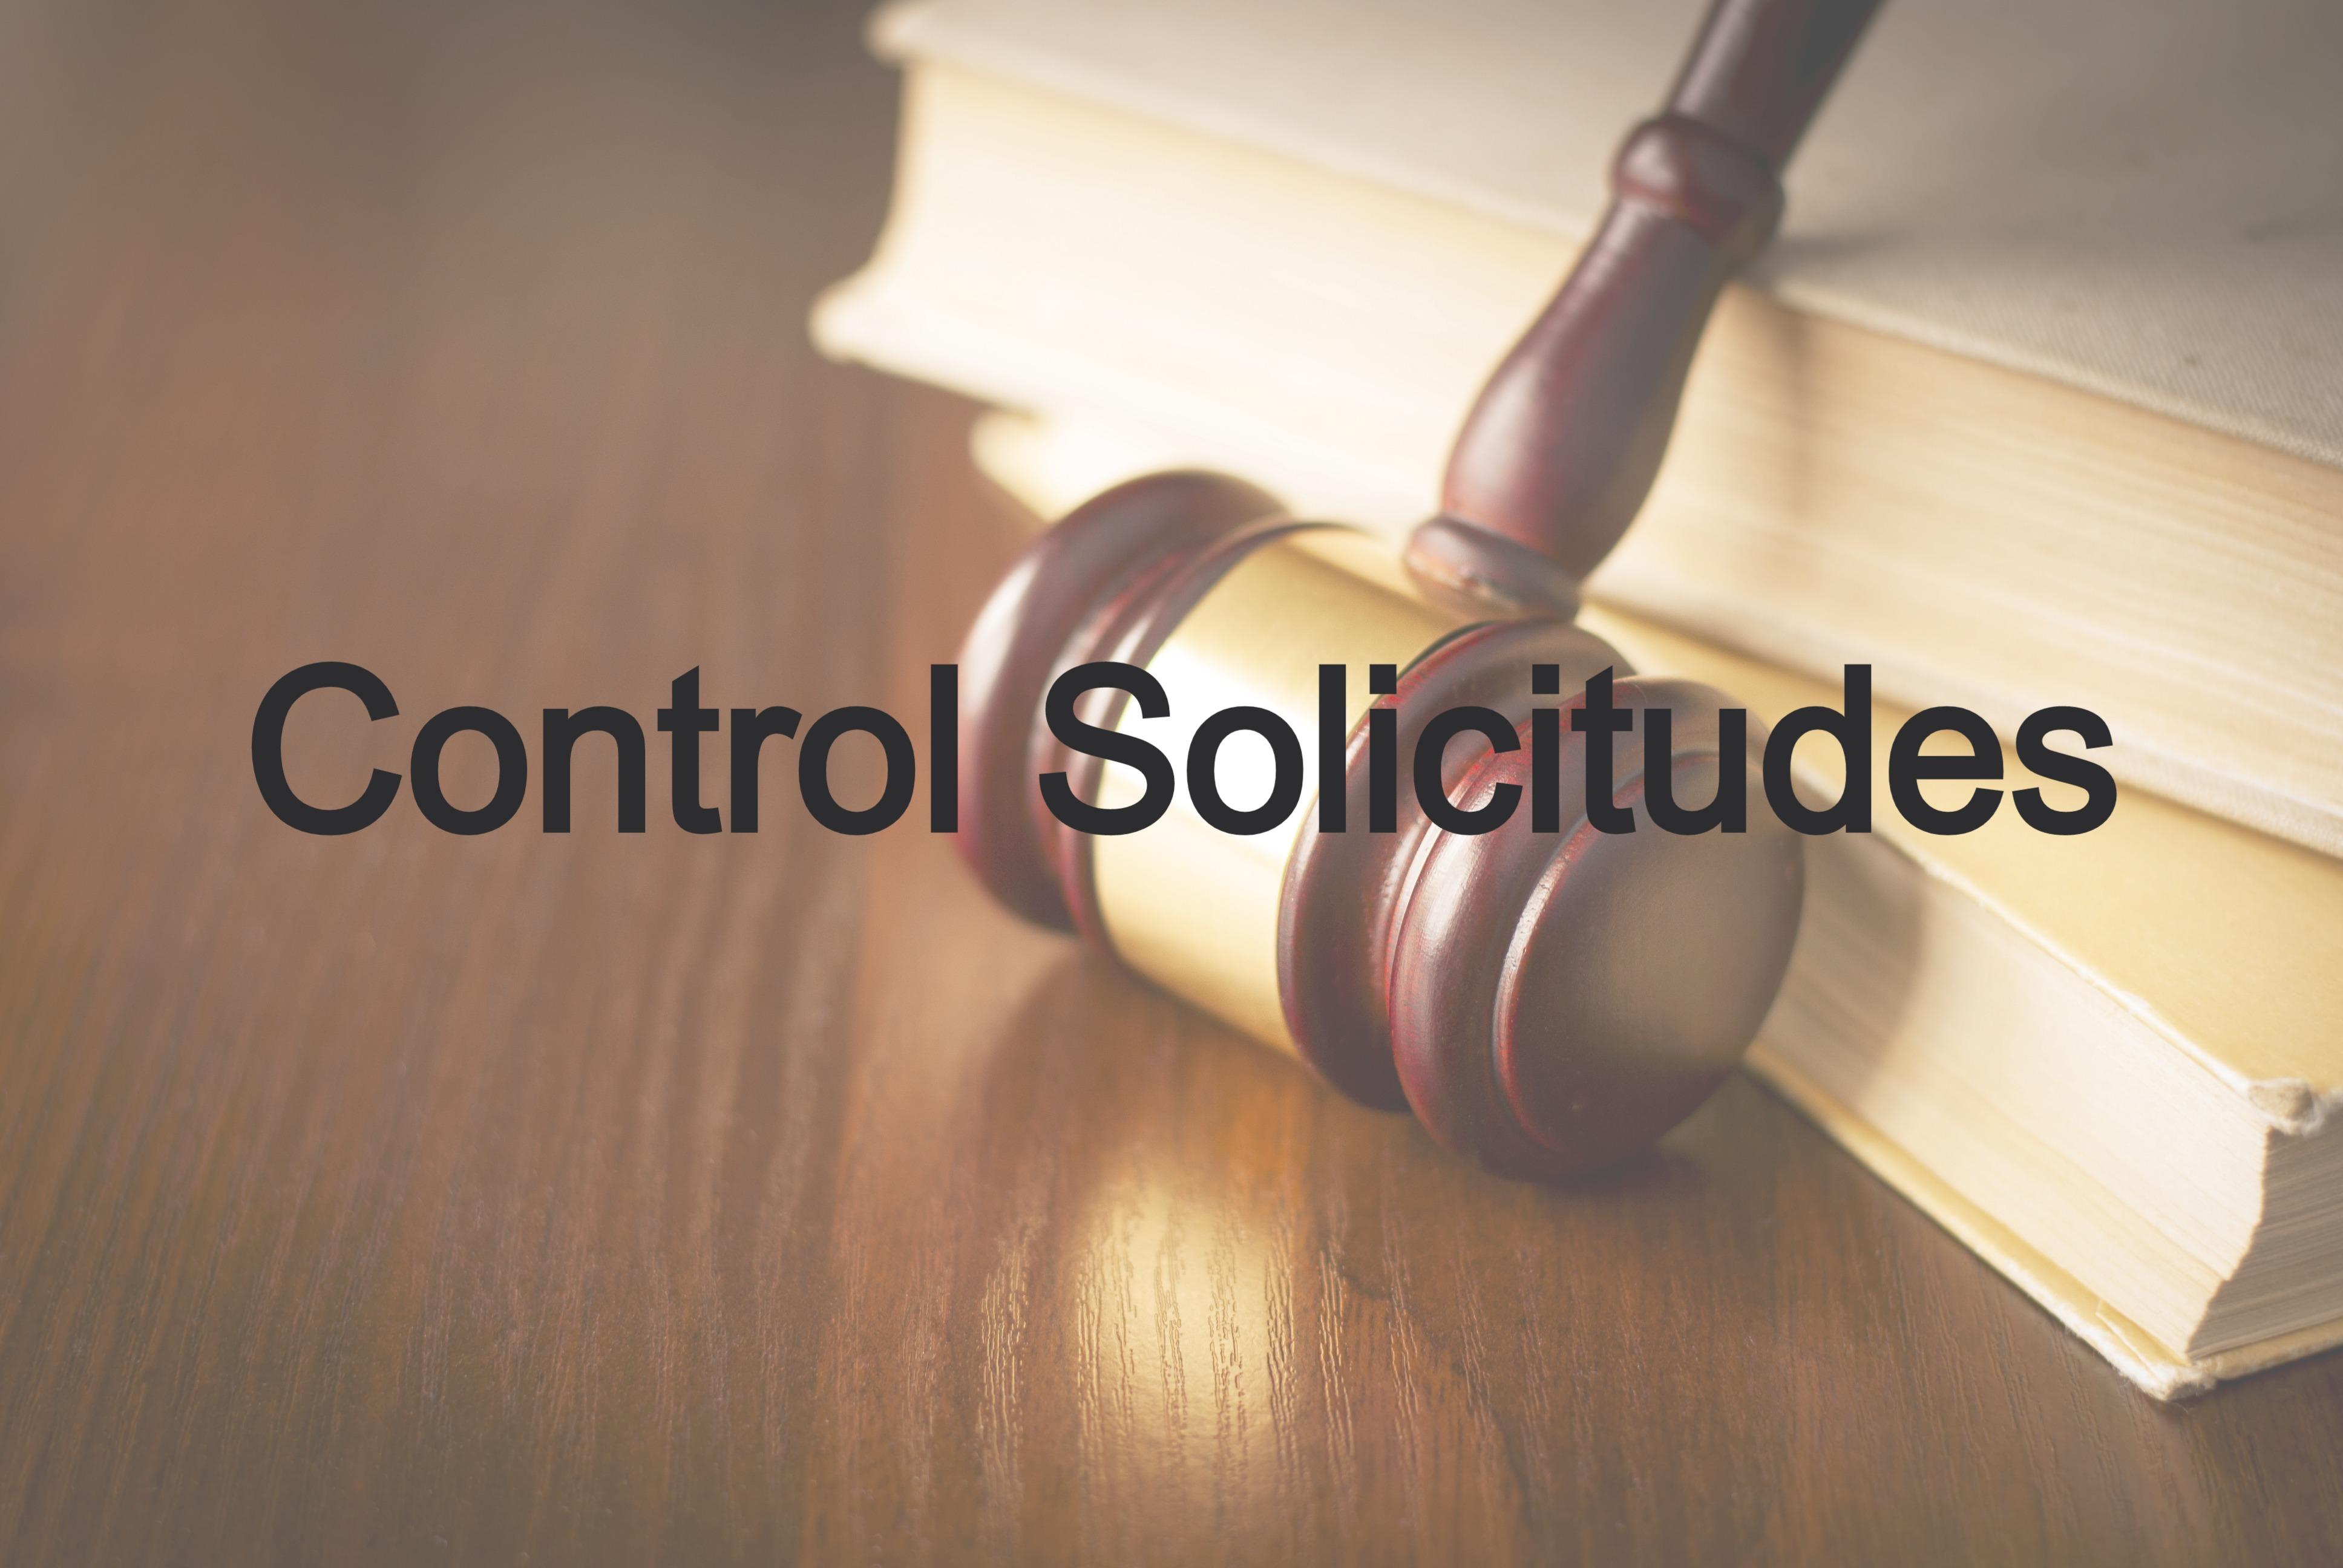 Control Solicitudes